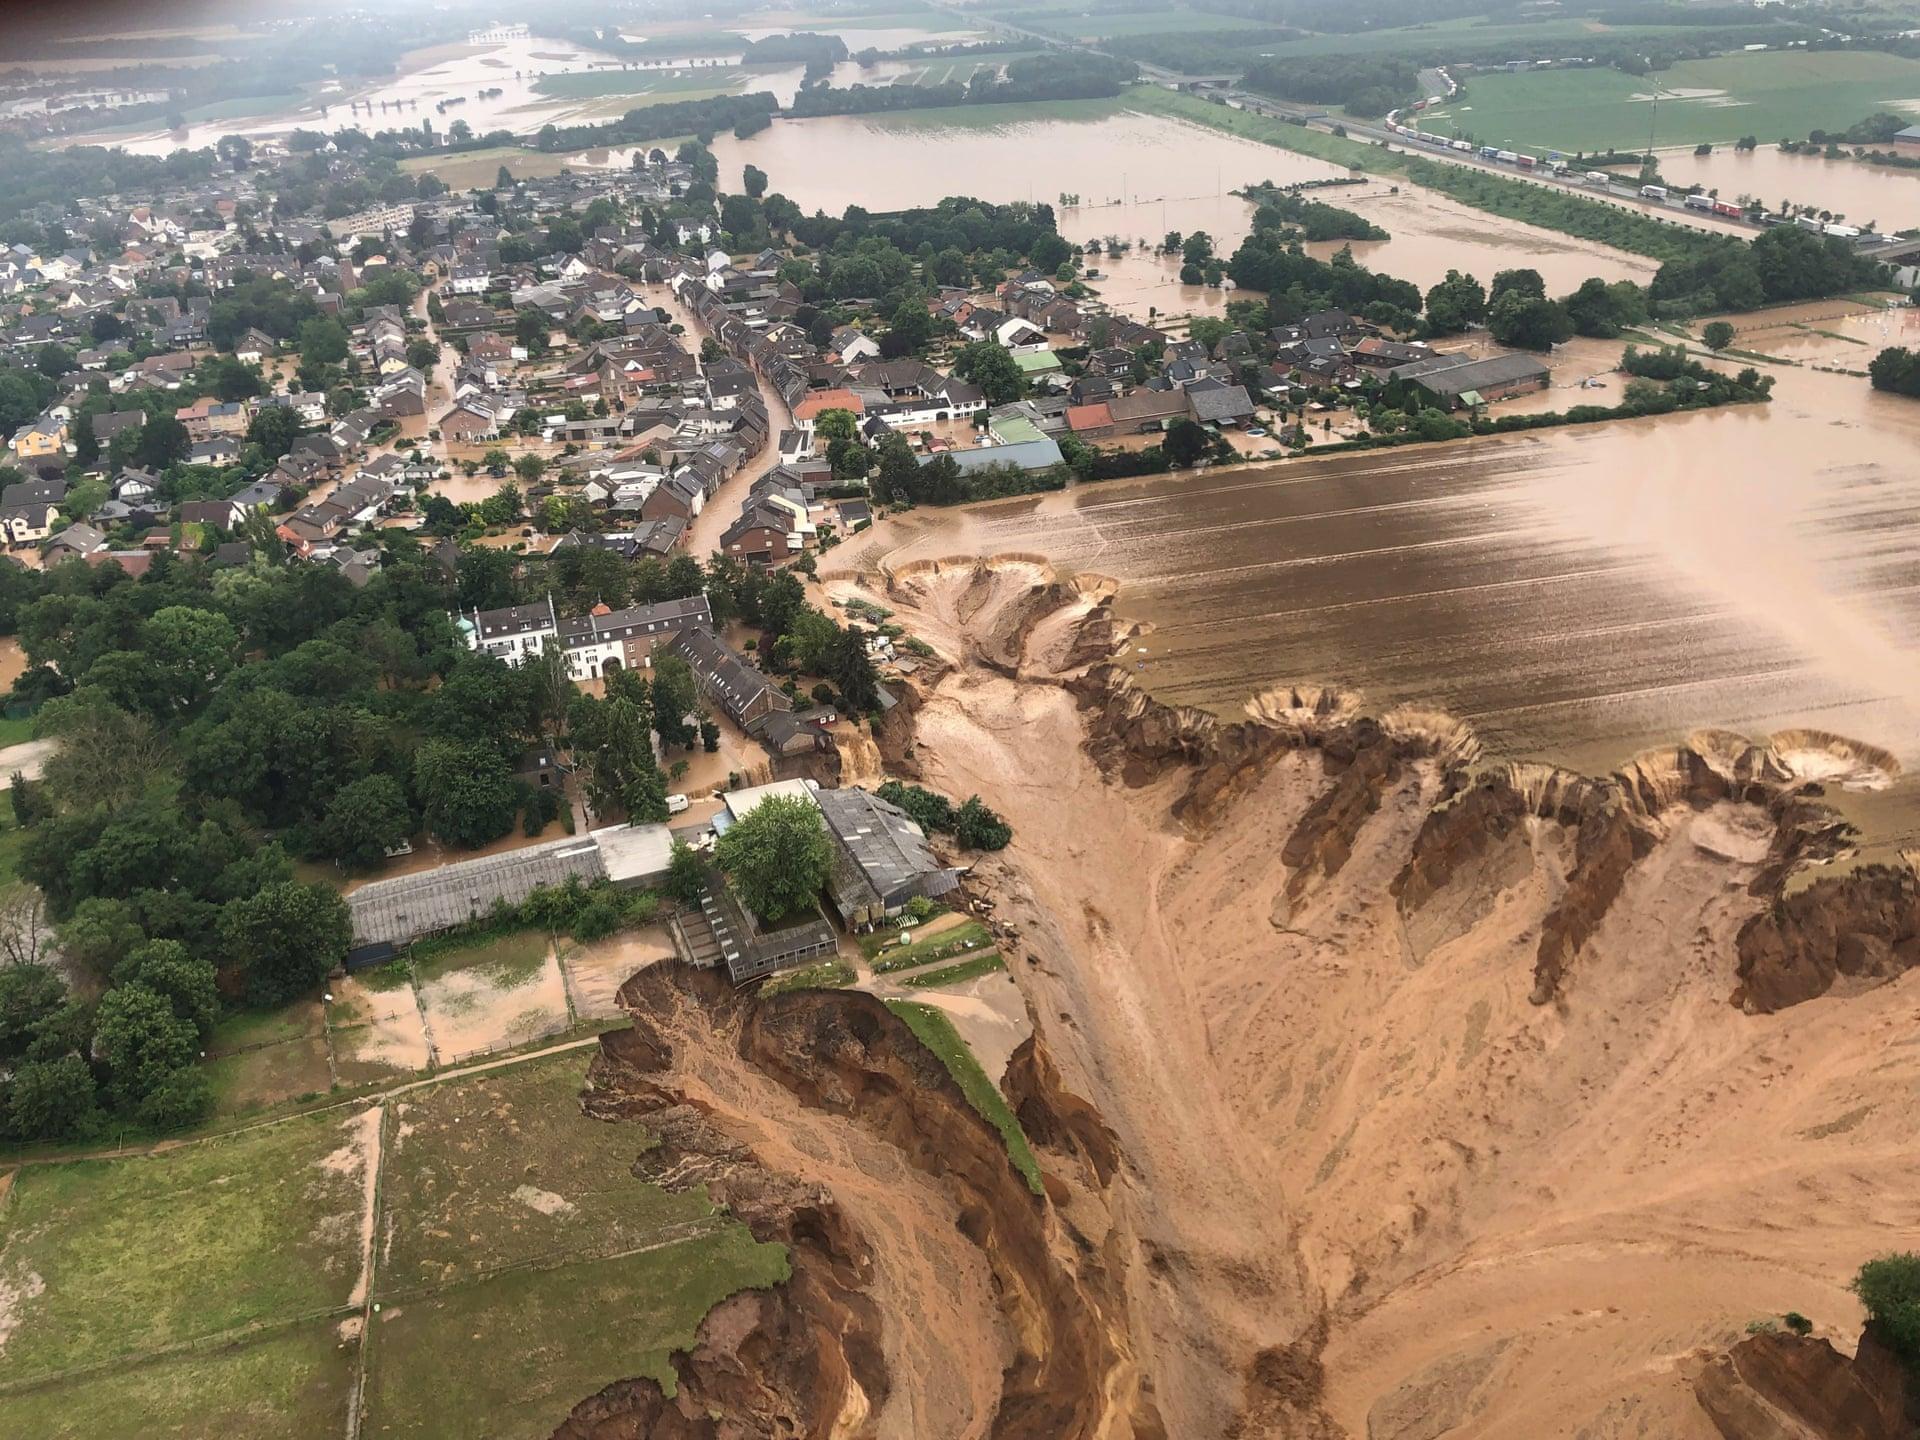 Fuertes precipitaciones e inundaciones - Foto Rhein-Erft-Kreis Handout/EPA